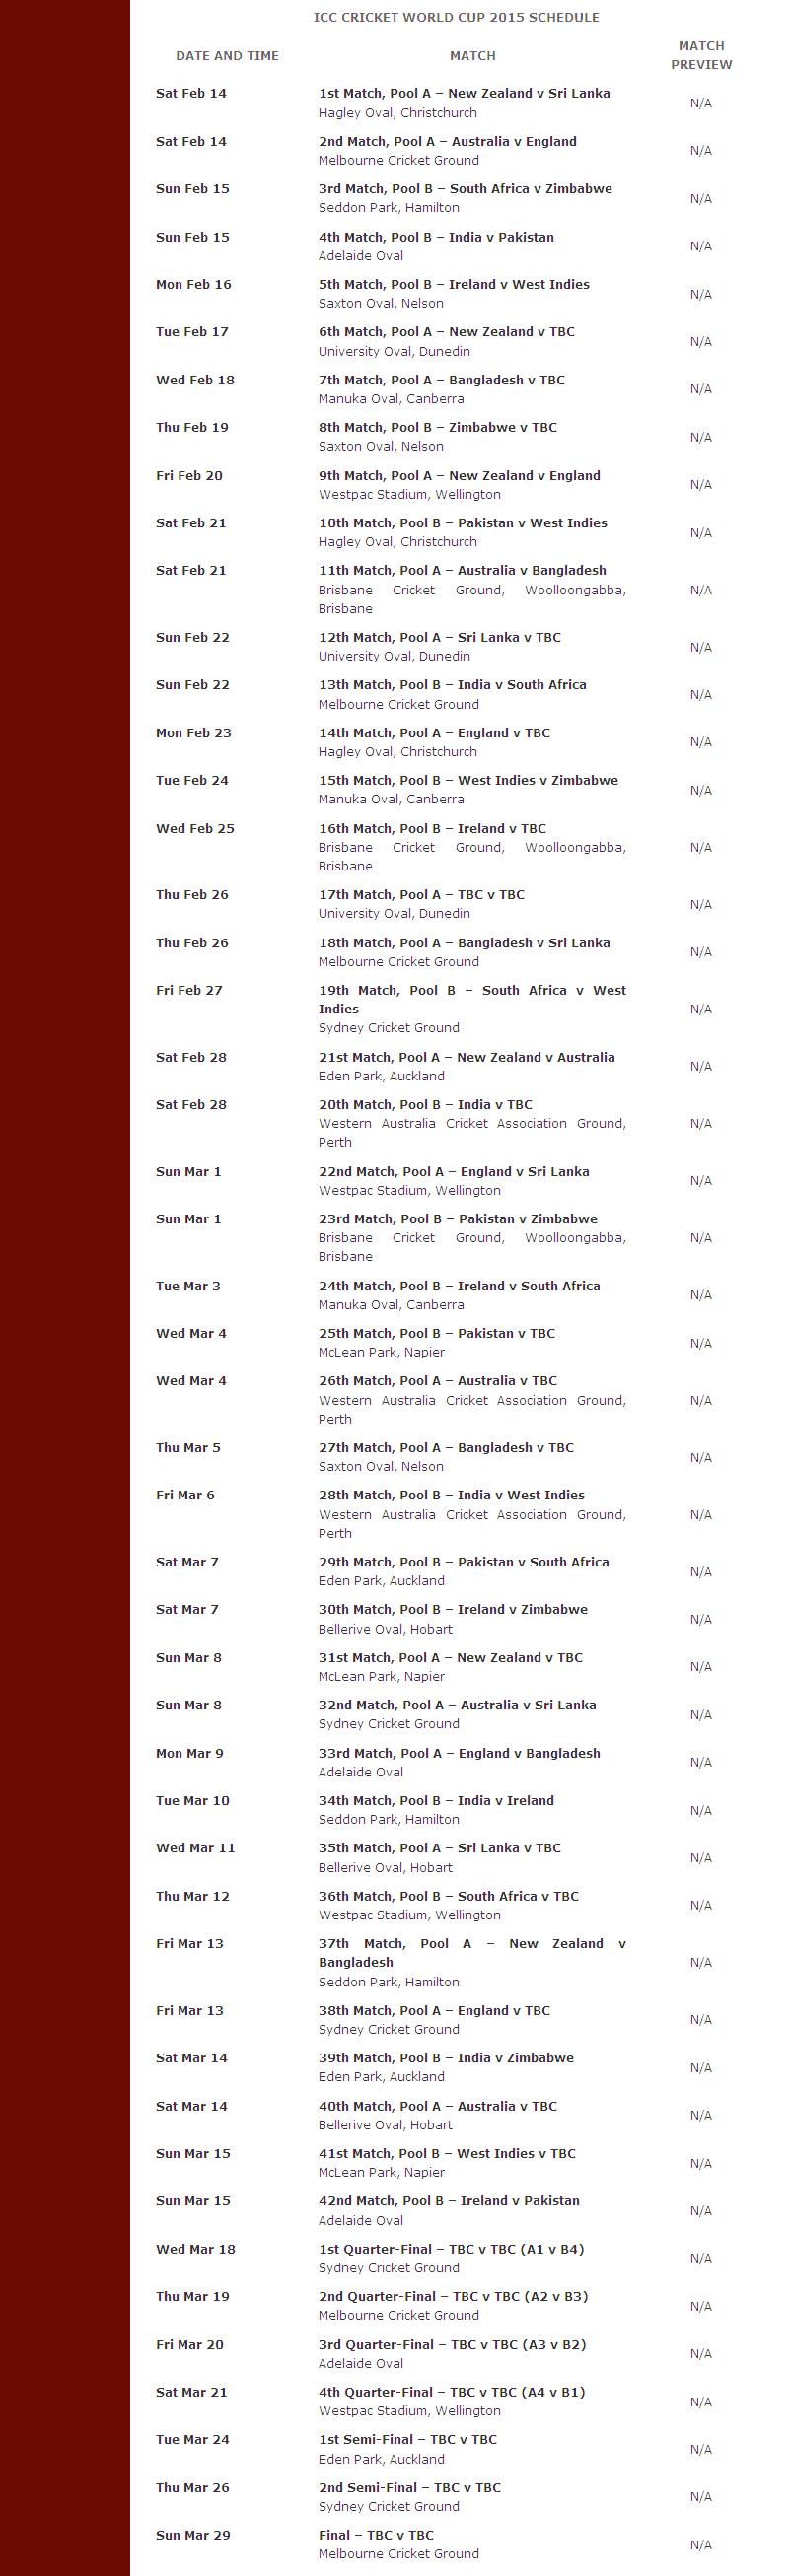 Icc Cricket World Cup Schedule 2015 Honeysoftsolutions